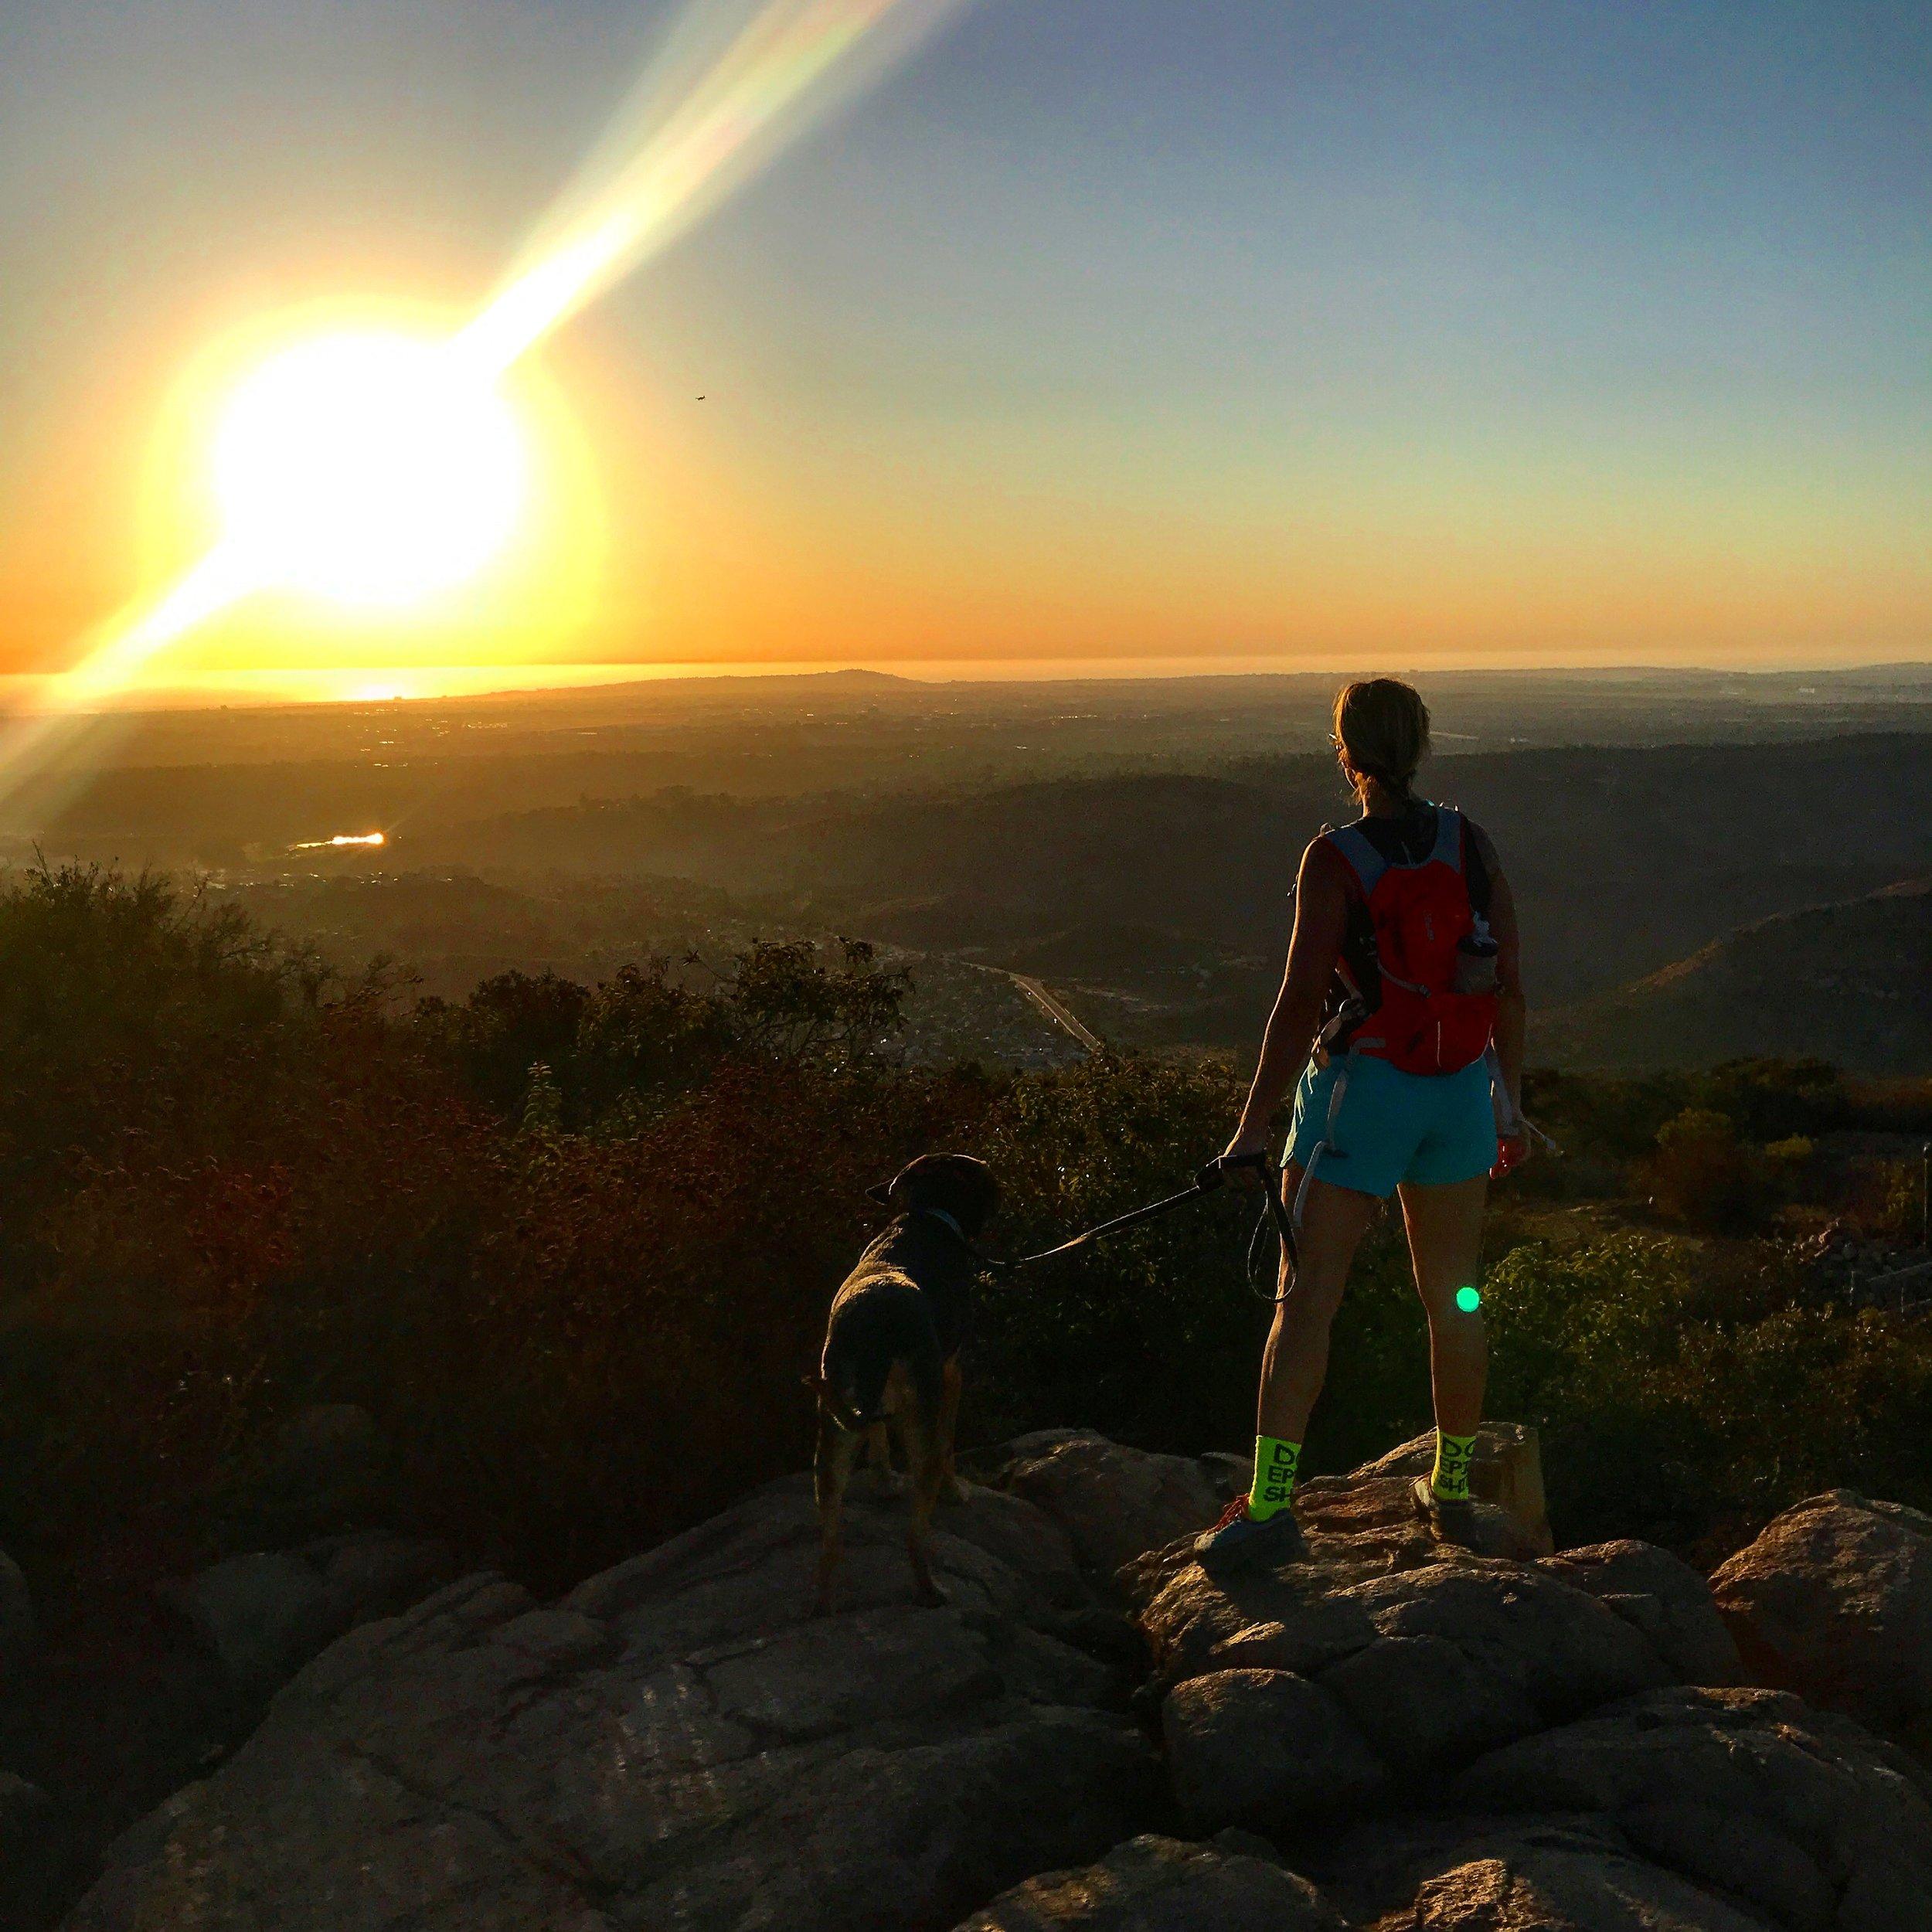 Mer_hiking_Mission_trails